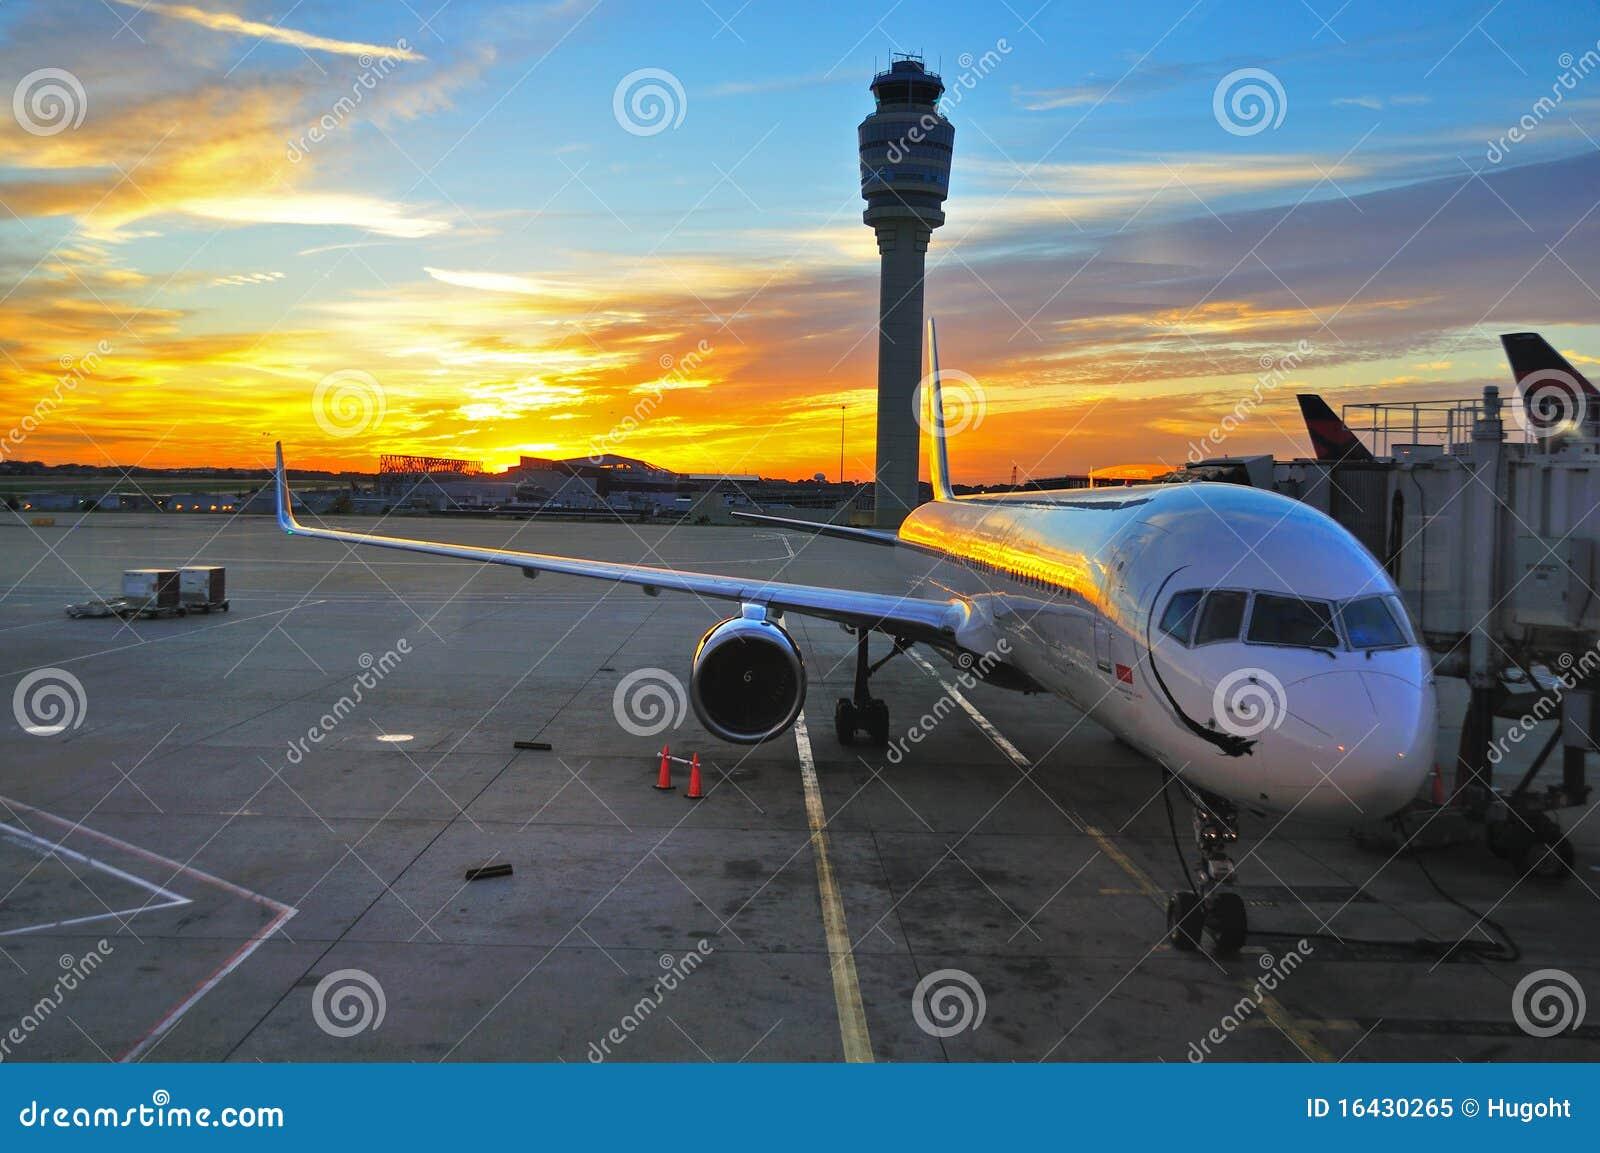 Airplane at sunrise